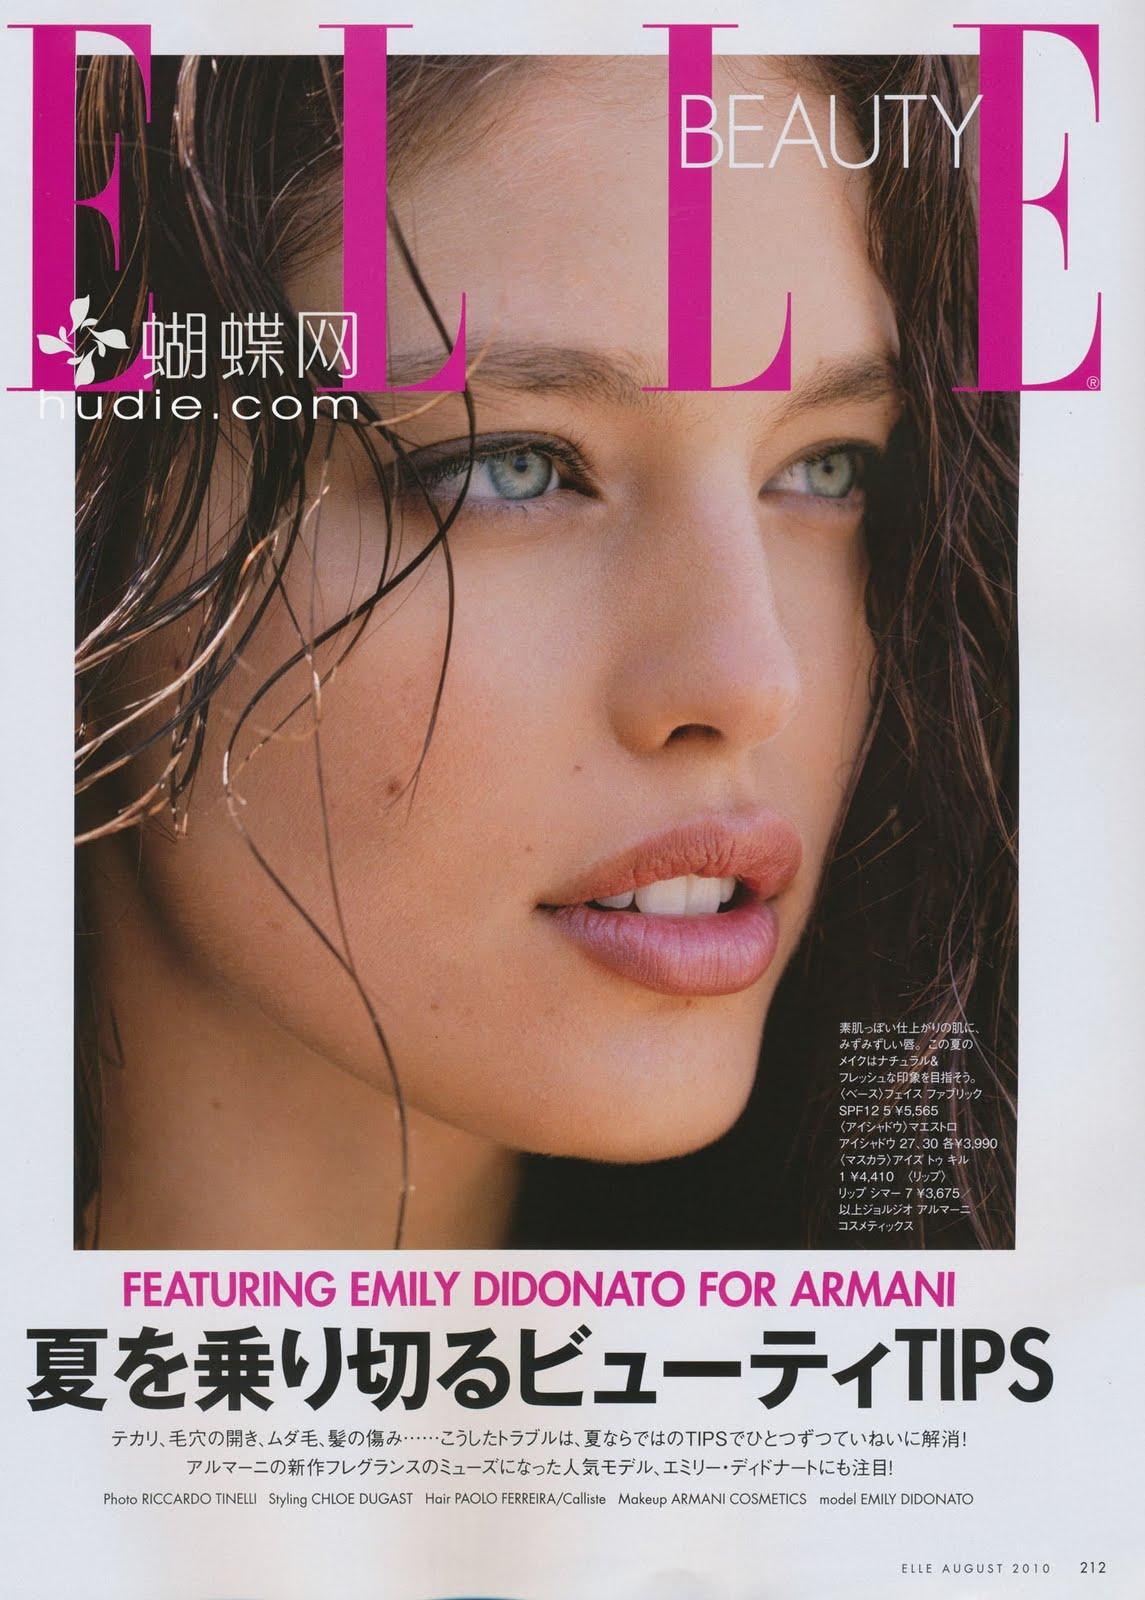 http://2.bp.blogspot.com/_mKeaqyocUS0/THVH_-M3mZI/AAAAAAAAEUg/692FHChOEzc/s1600/40844_septimiu29_EmilyDidonato_ElleJapan_August20101_122_130lo.jpg